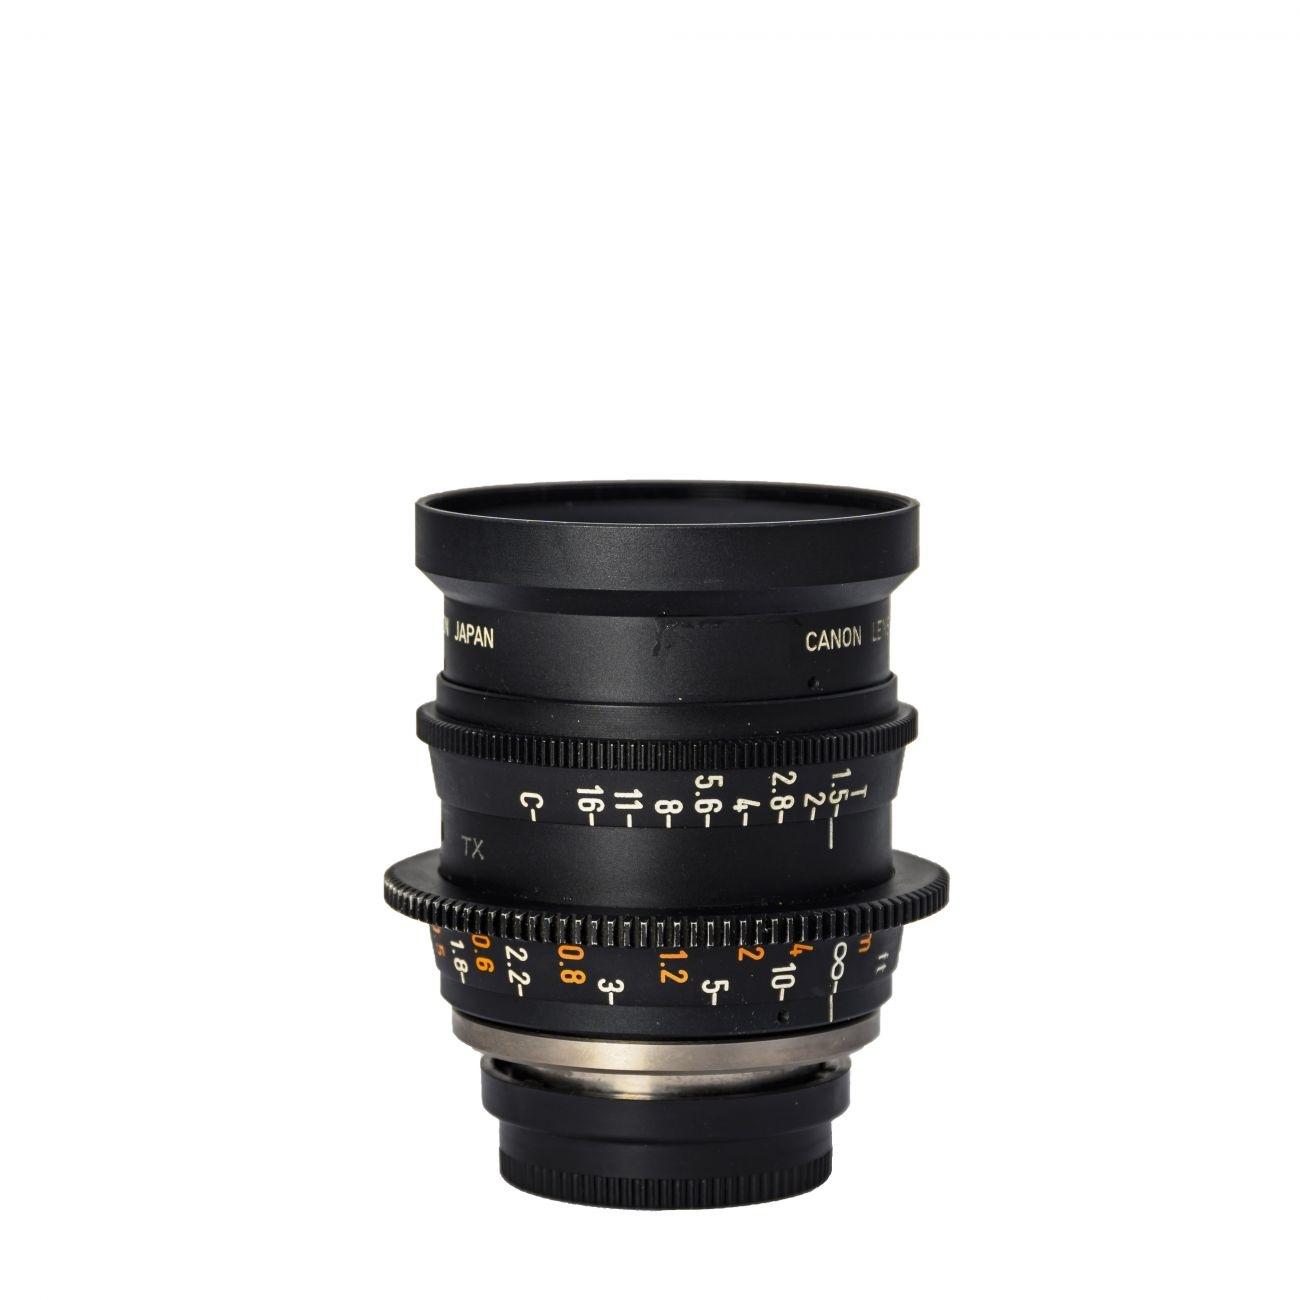 35mm lens Canon EJ T1.5 B4-mount